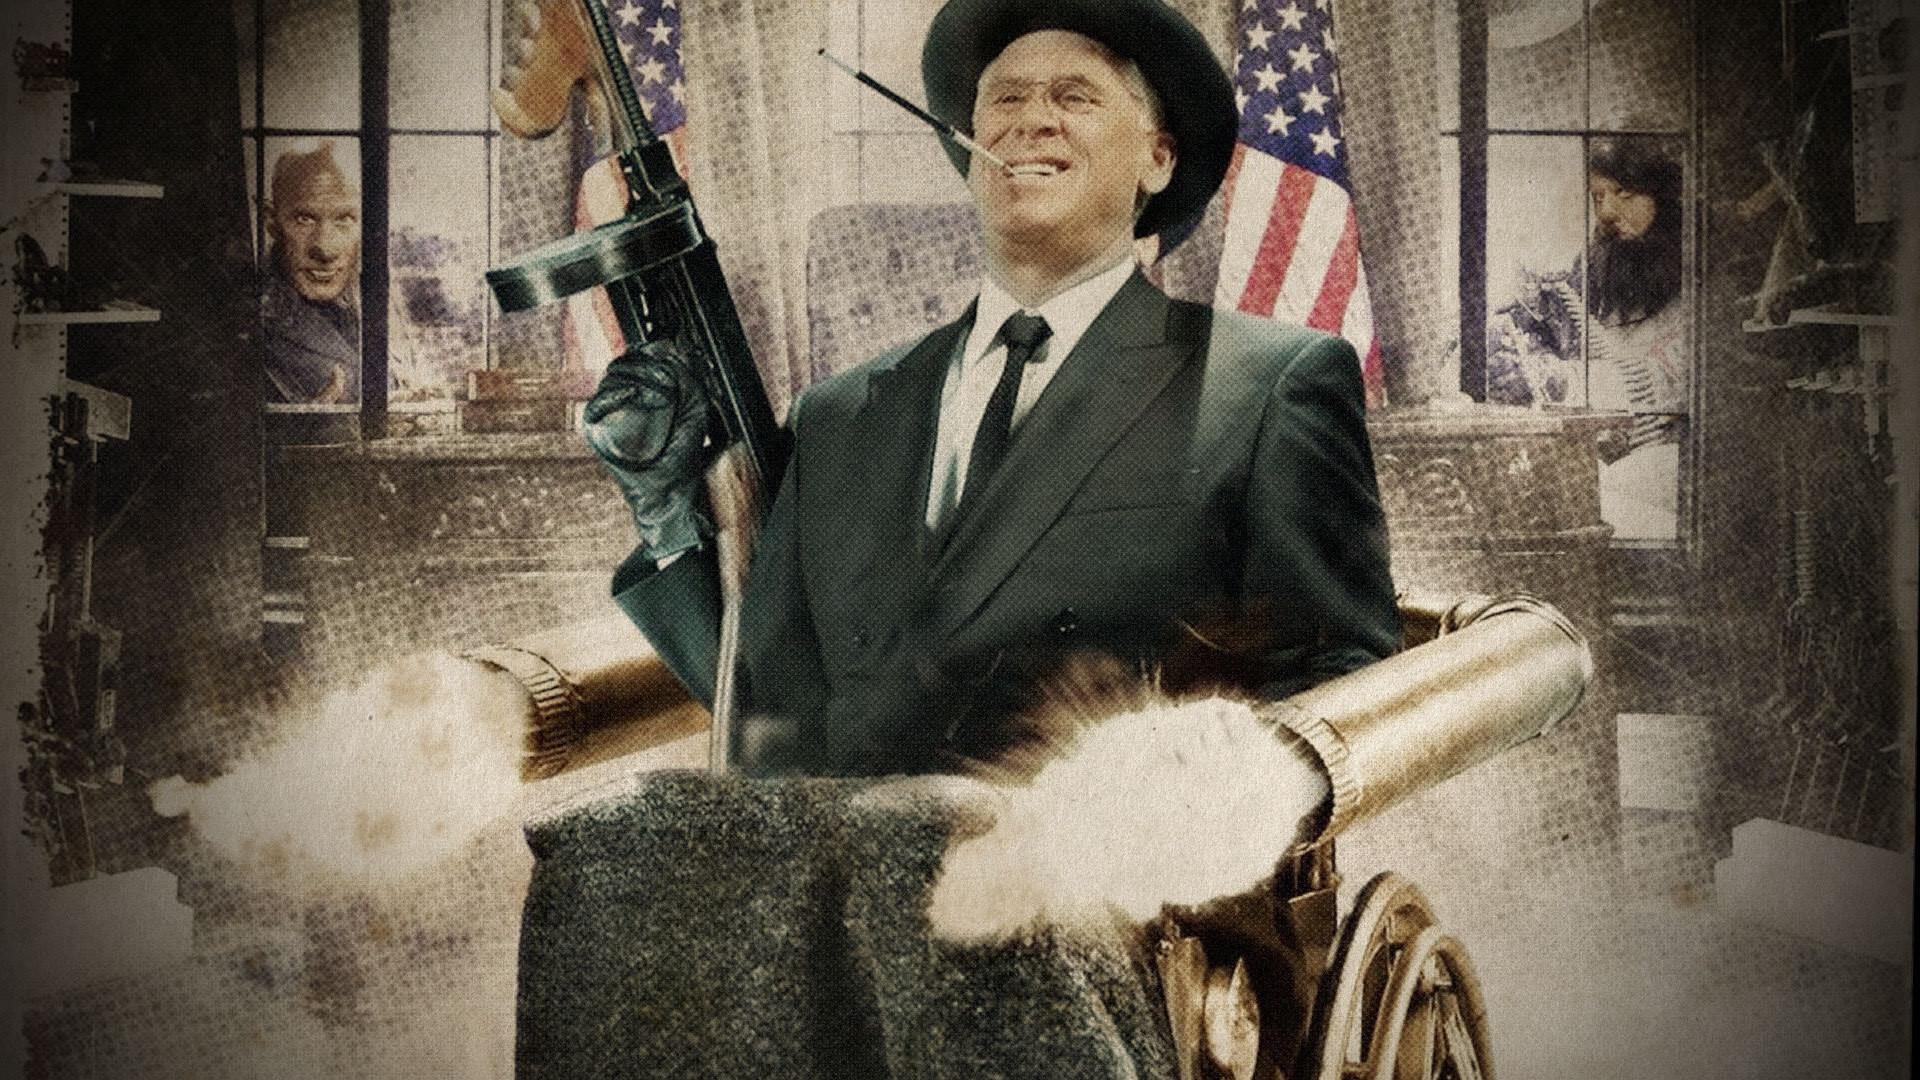 Badass President Wallpapers (72+ images)Badass Presidents Fdr